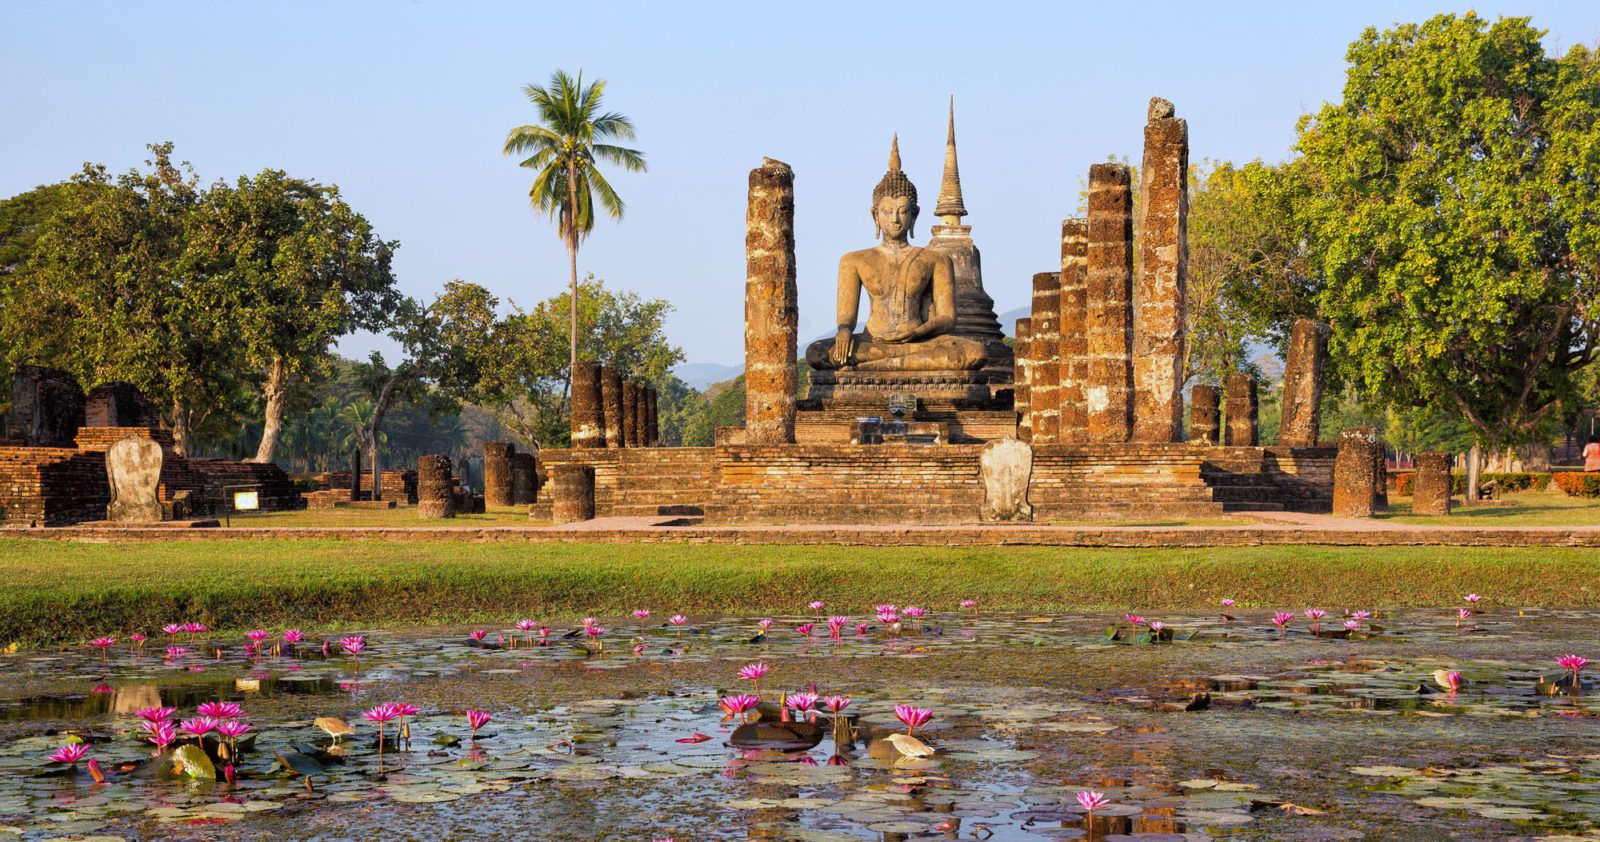 How to Visit Sukhothai